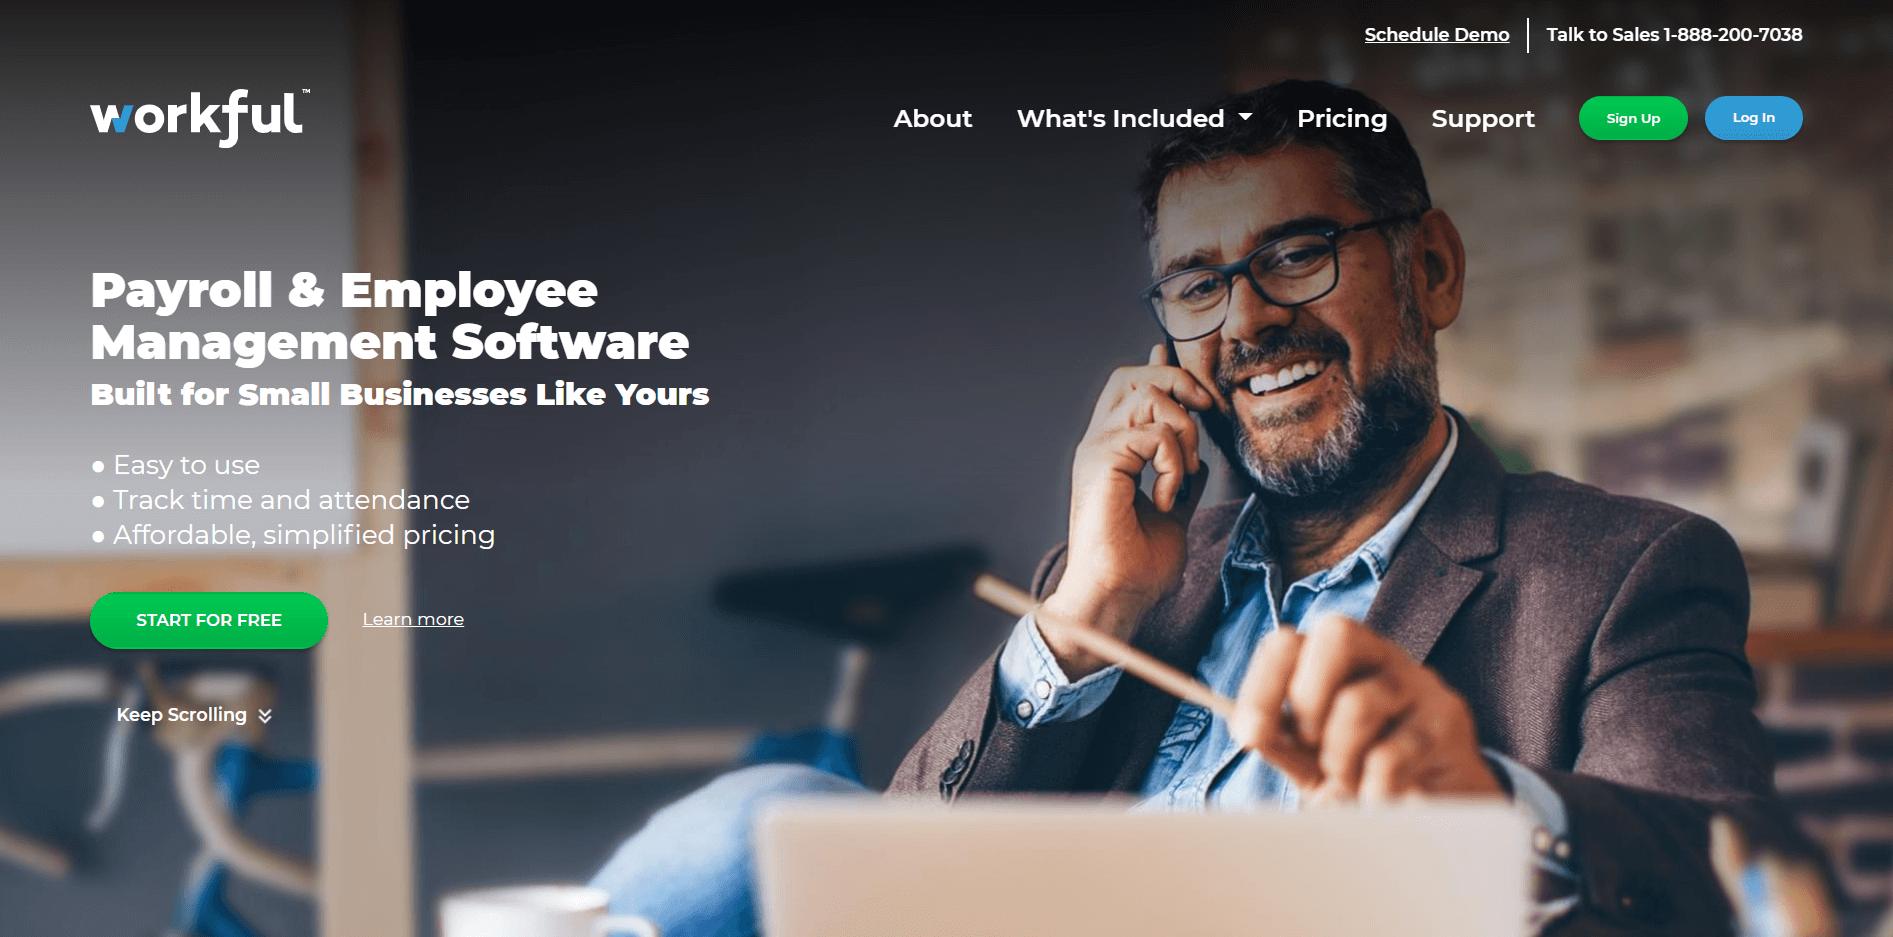 Workful's homepage